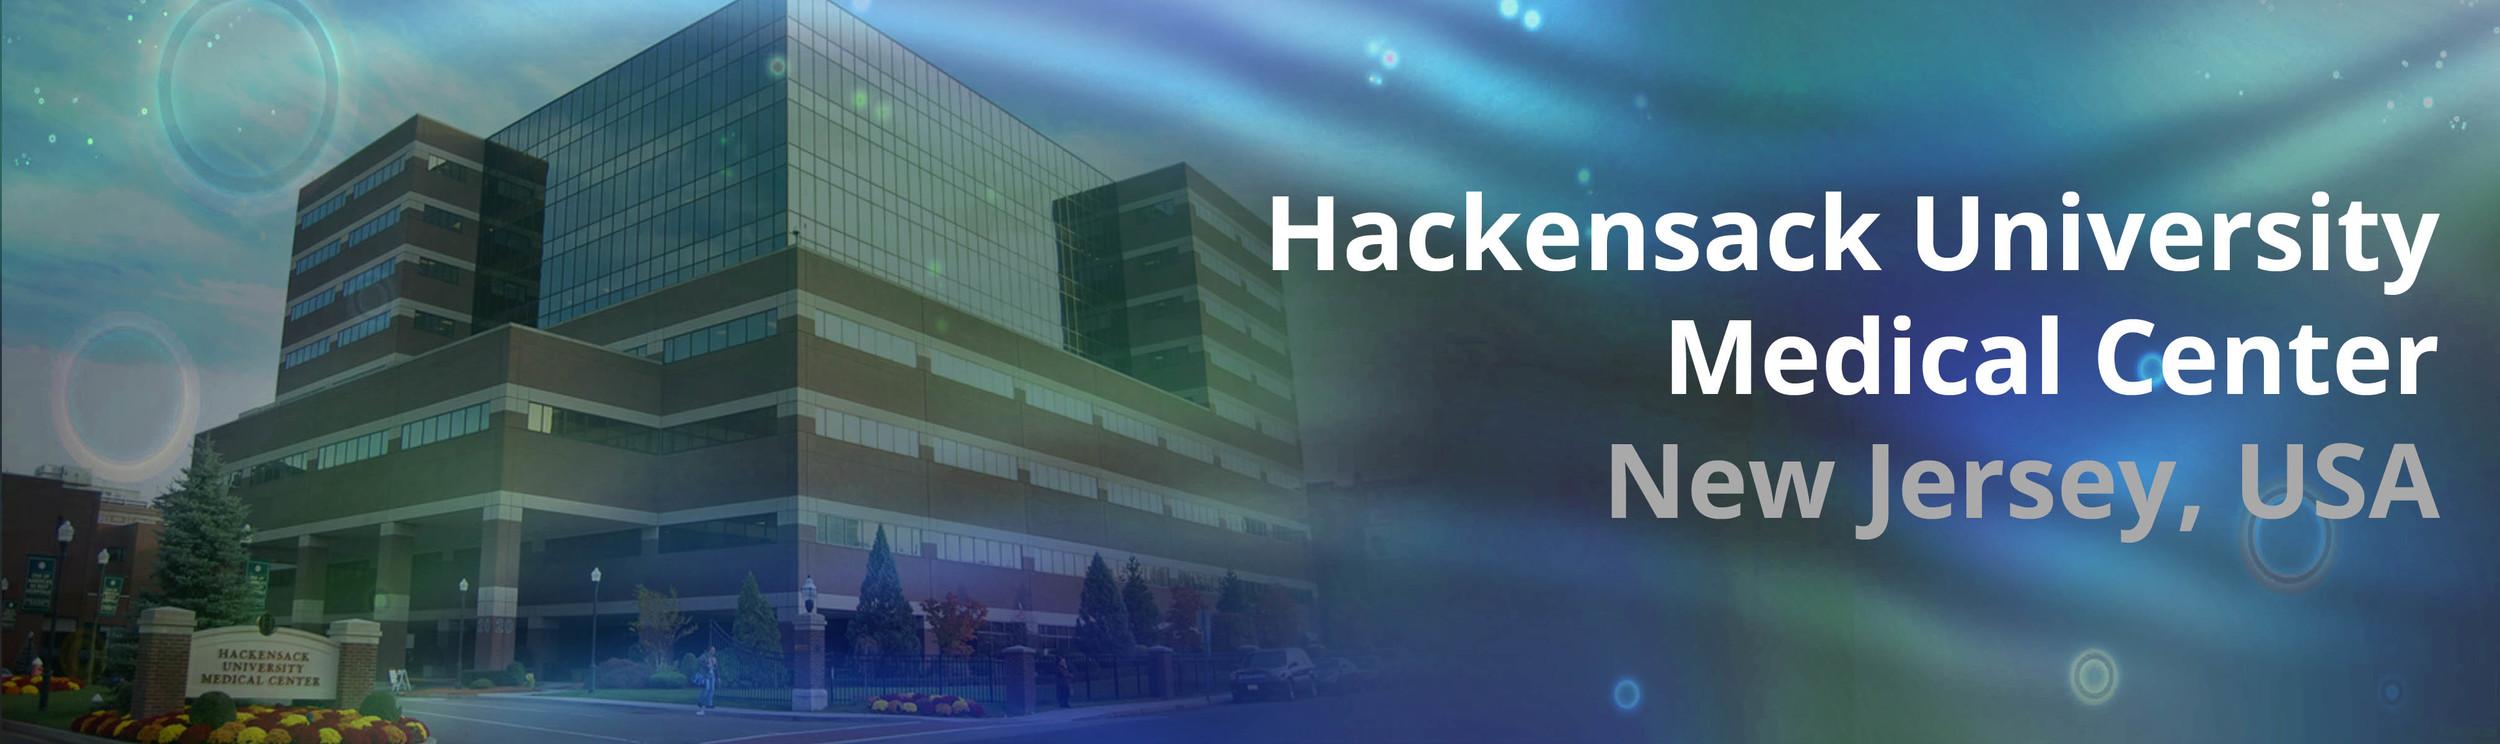 Hackensack university.jpg